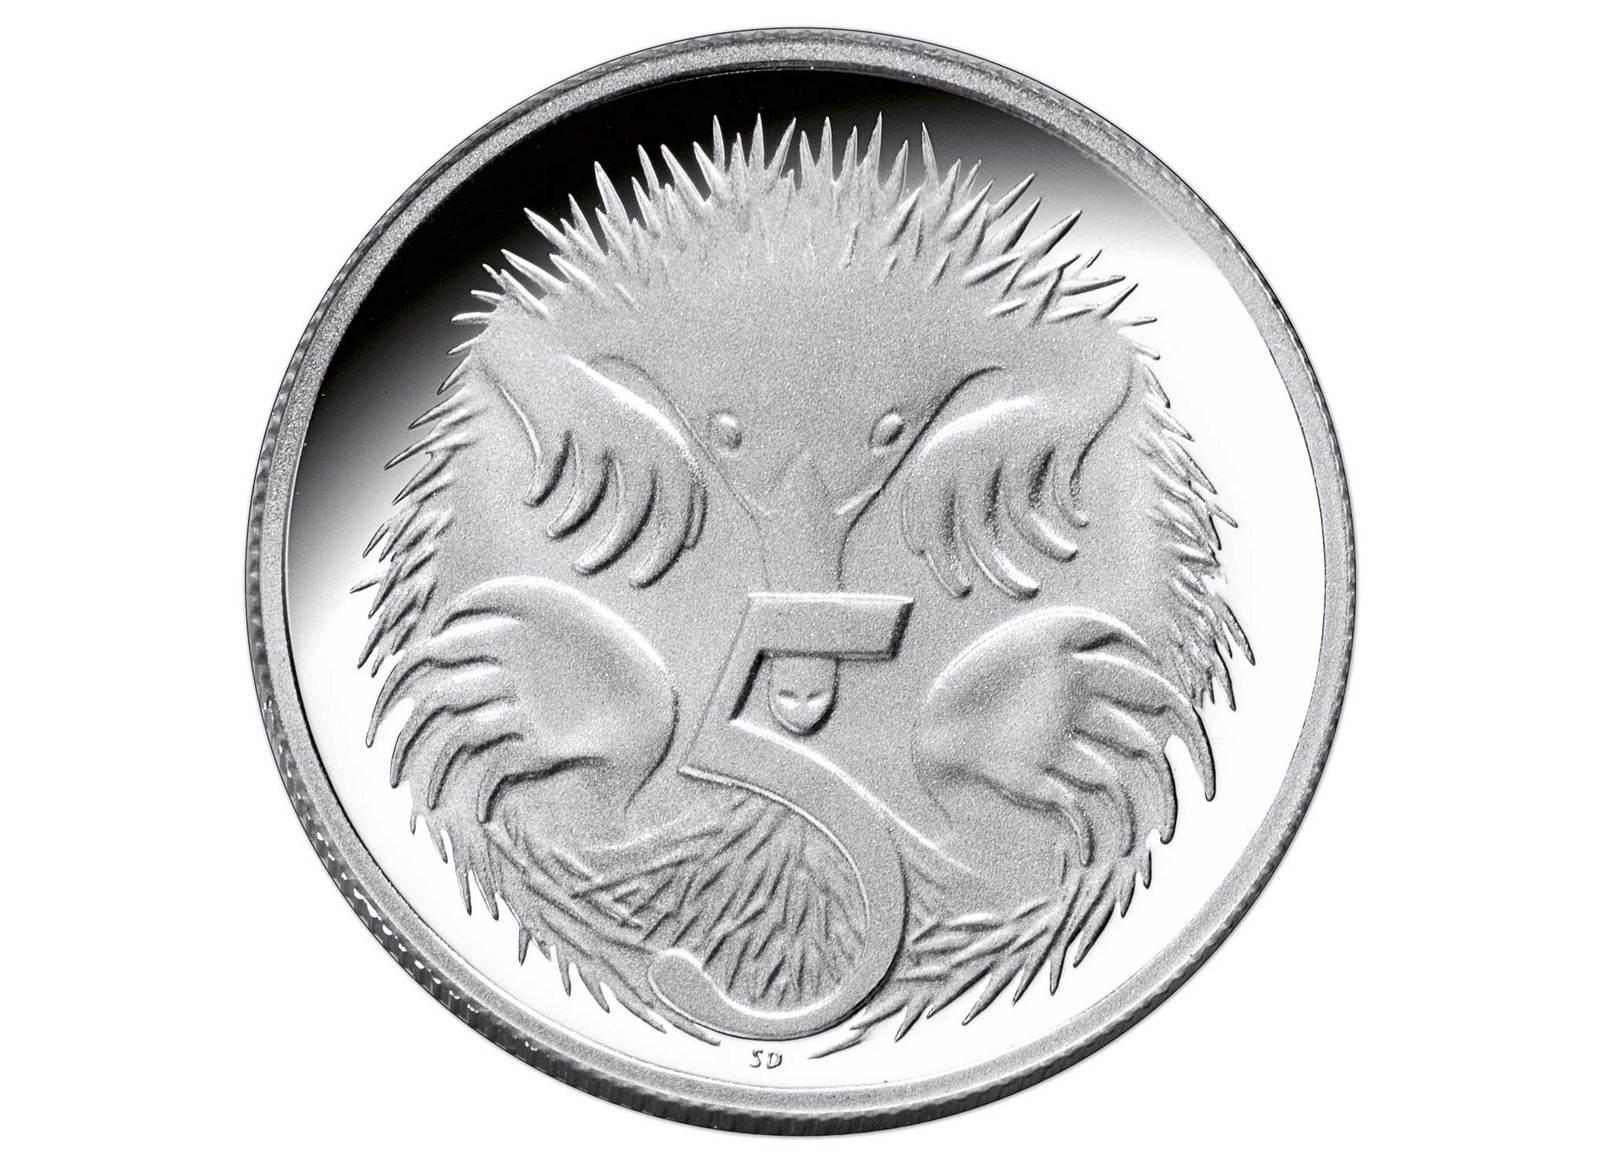 Coins Australia 2015 Fine Silver Proof Year Set